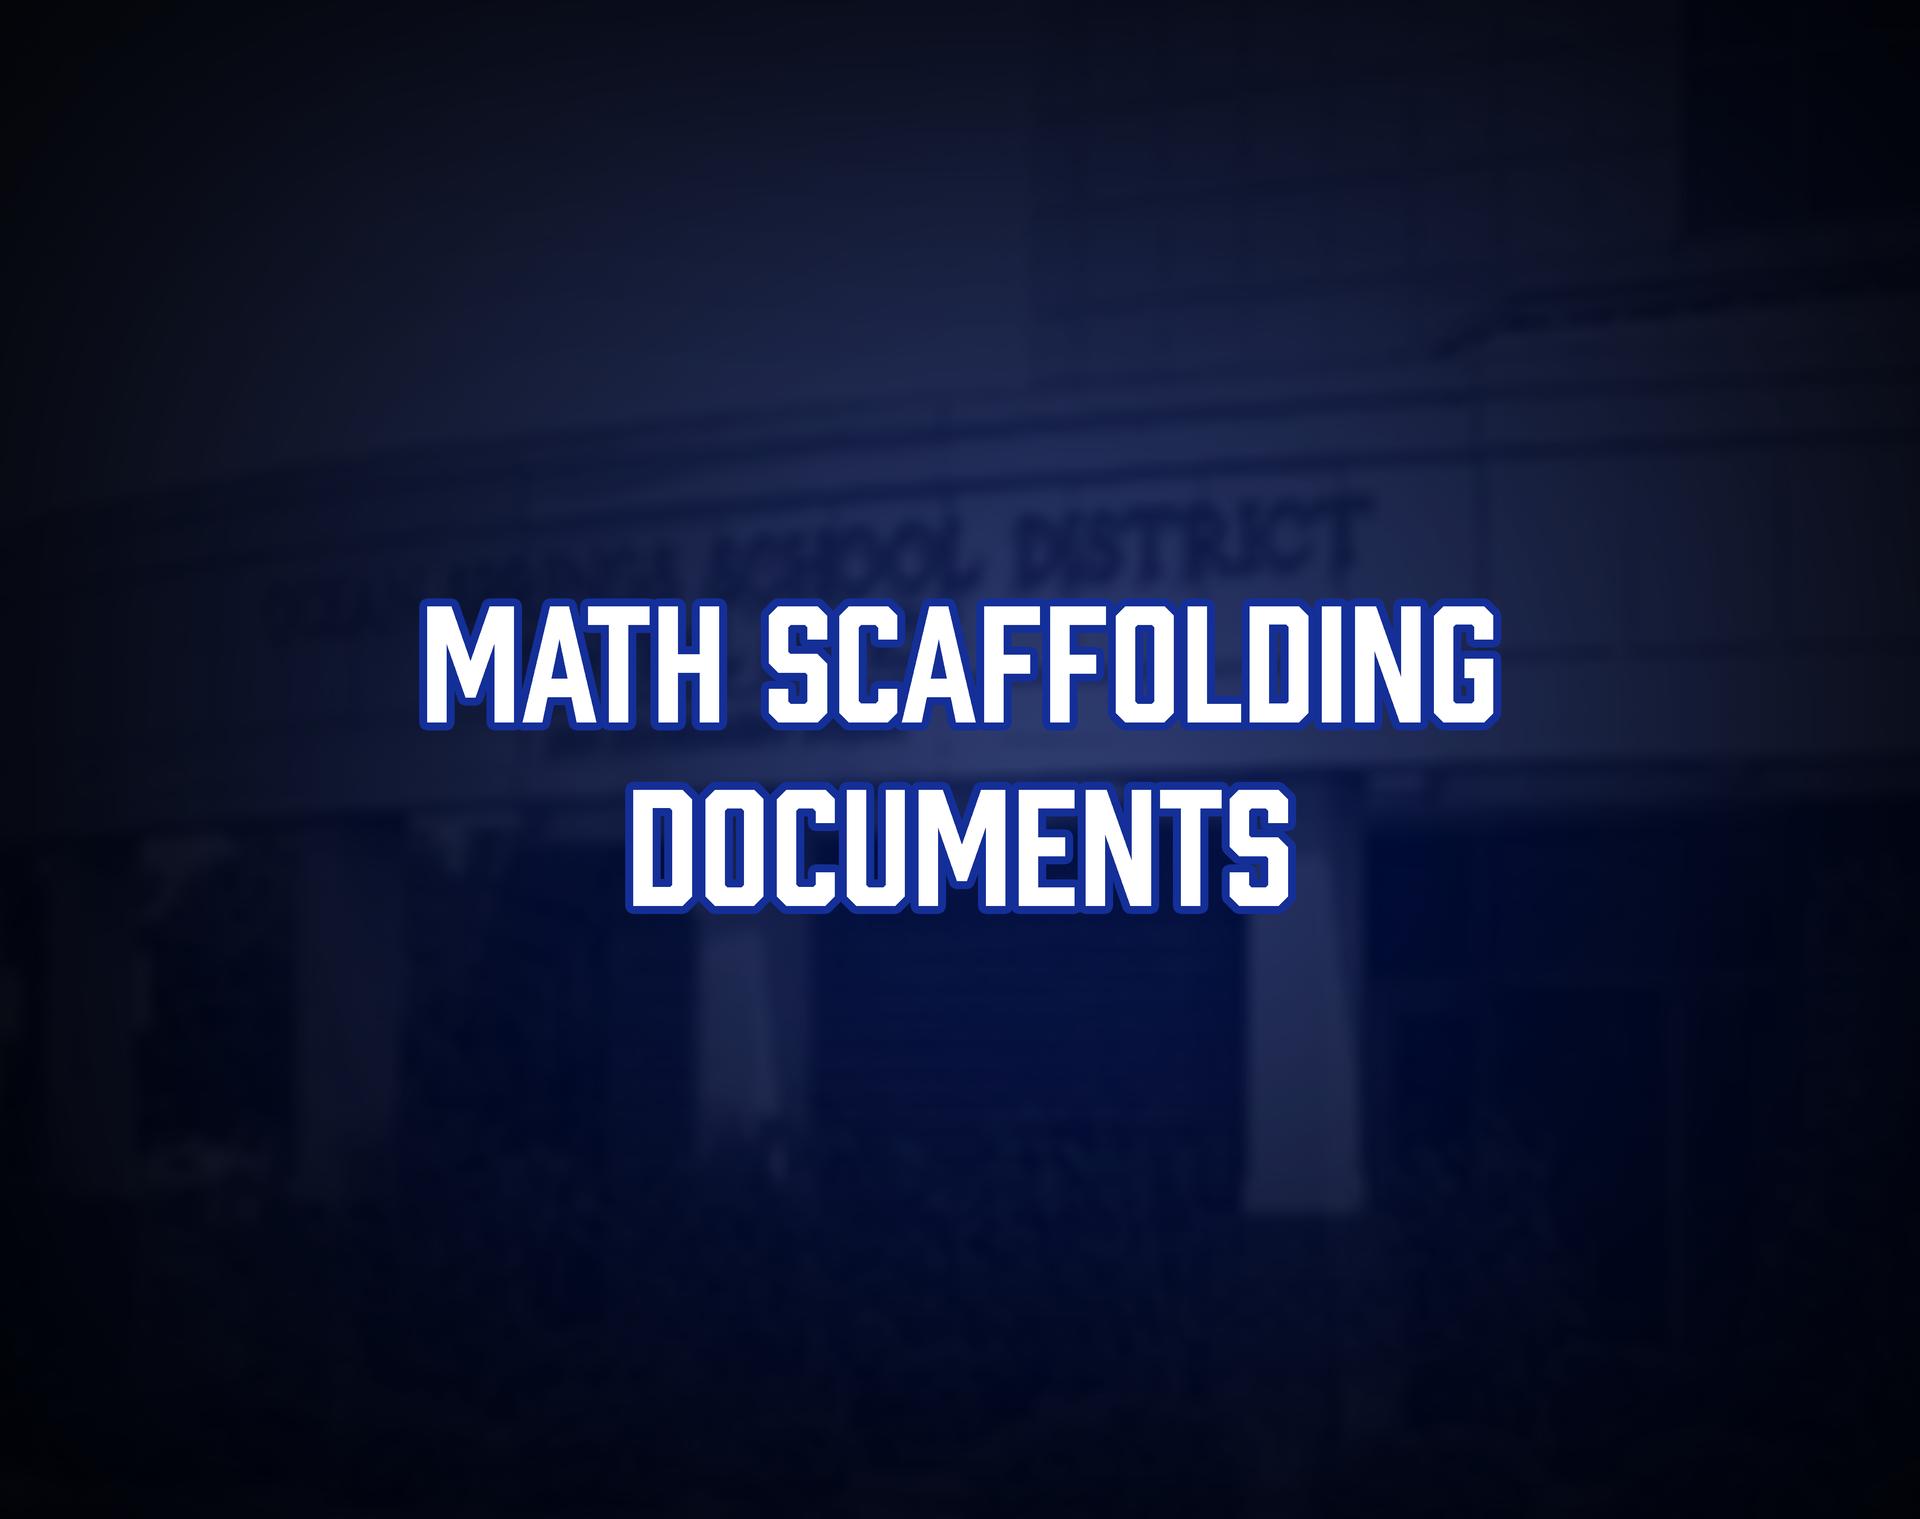 Math Scaffolding Documents